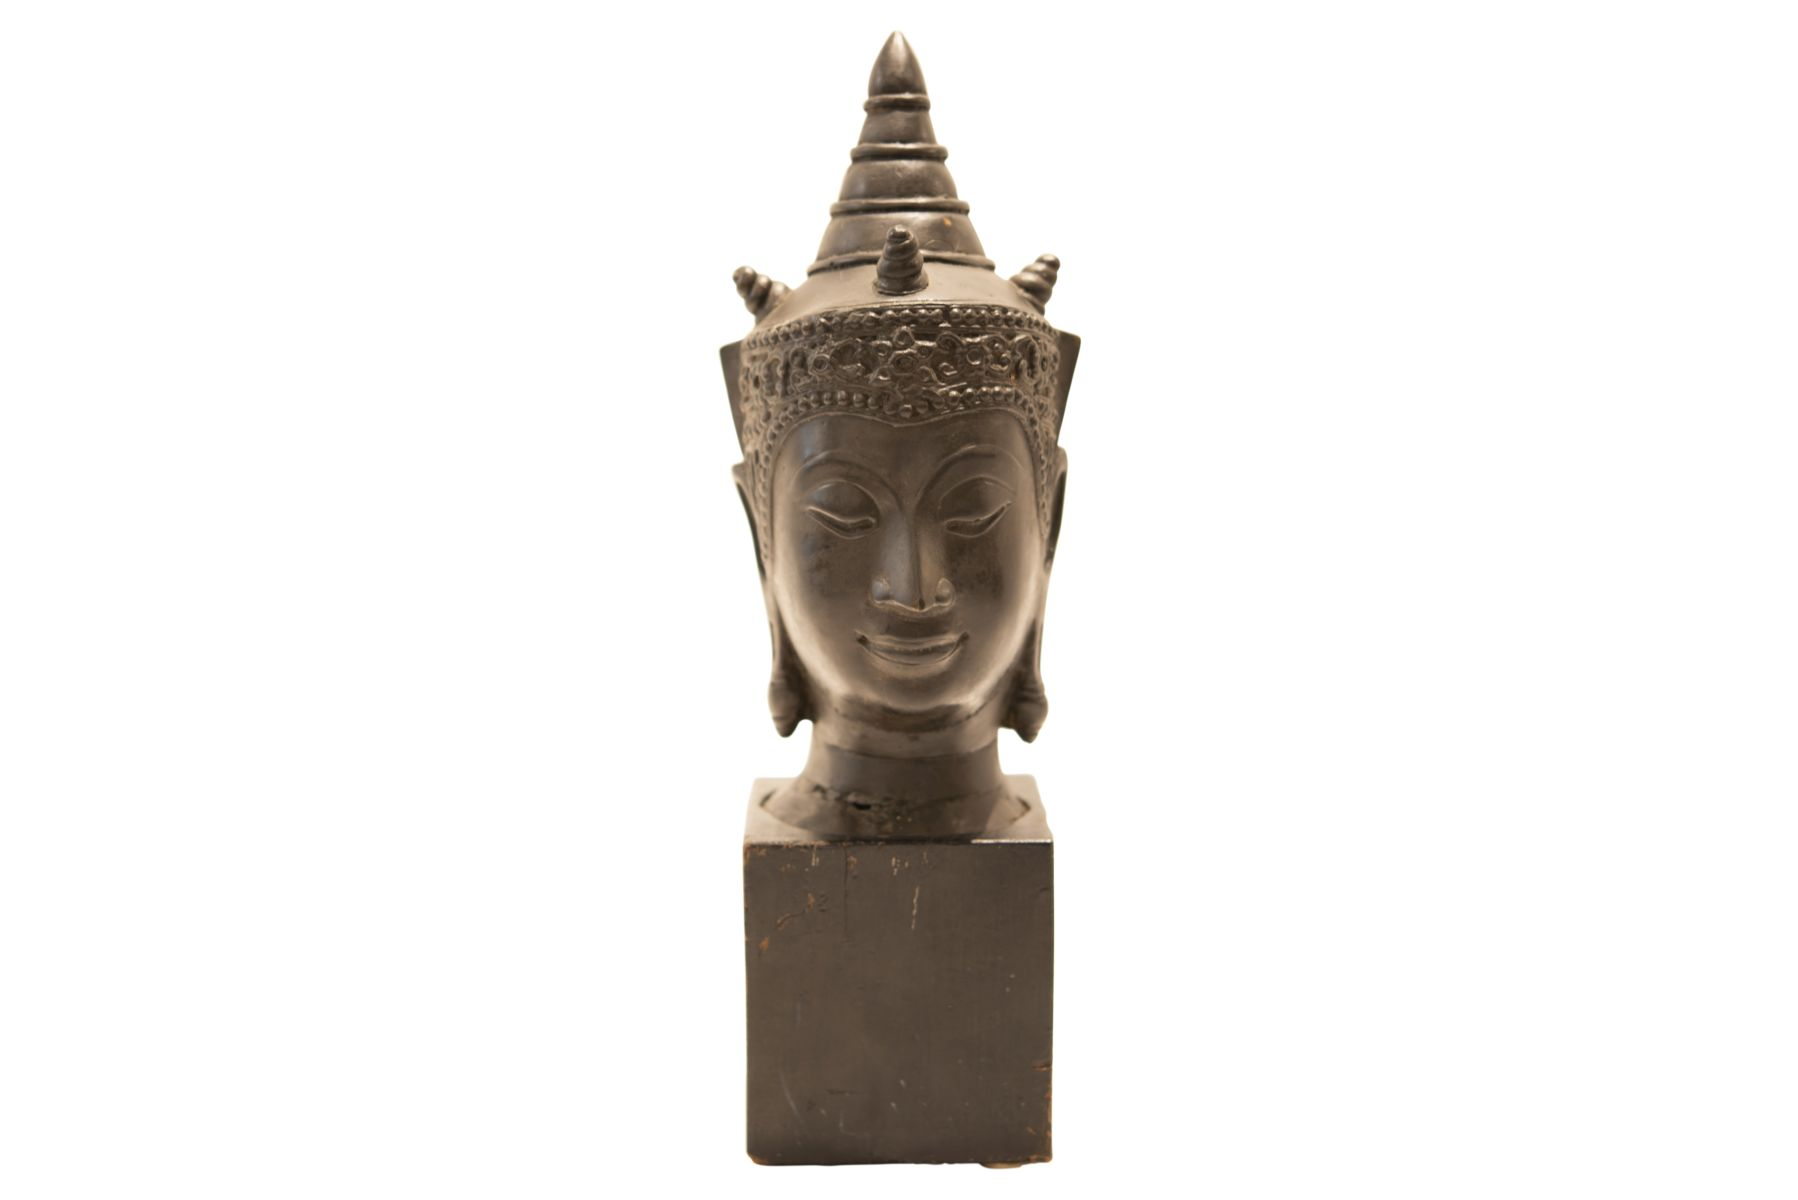 #89 Metal Buddha head on wooden base   Metall Buddha-Kopf auf Holzsockel Image